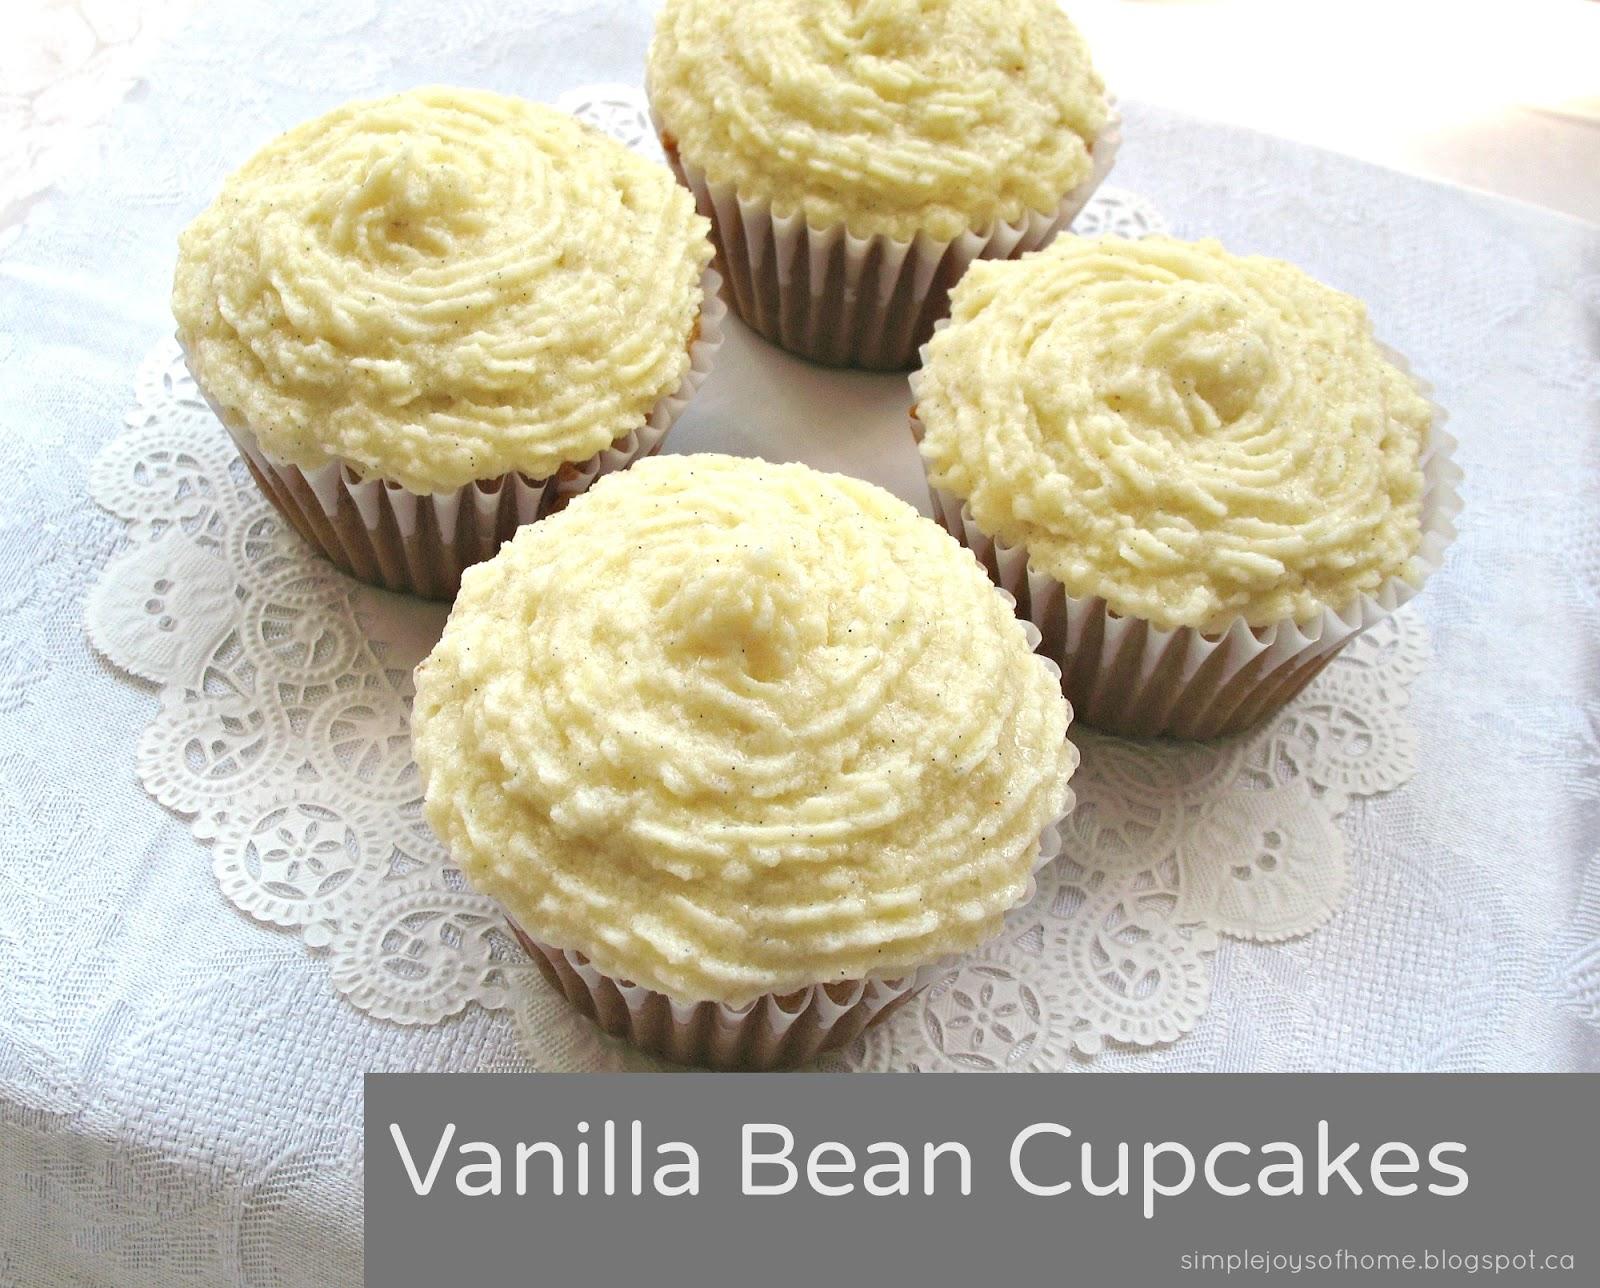 Simple Joys of Home - Vanilla Bean Cupcakes